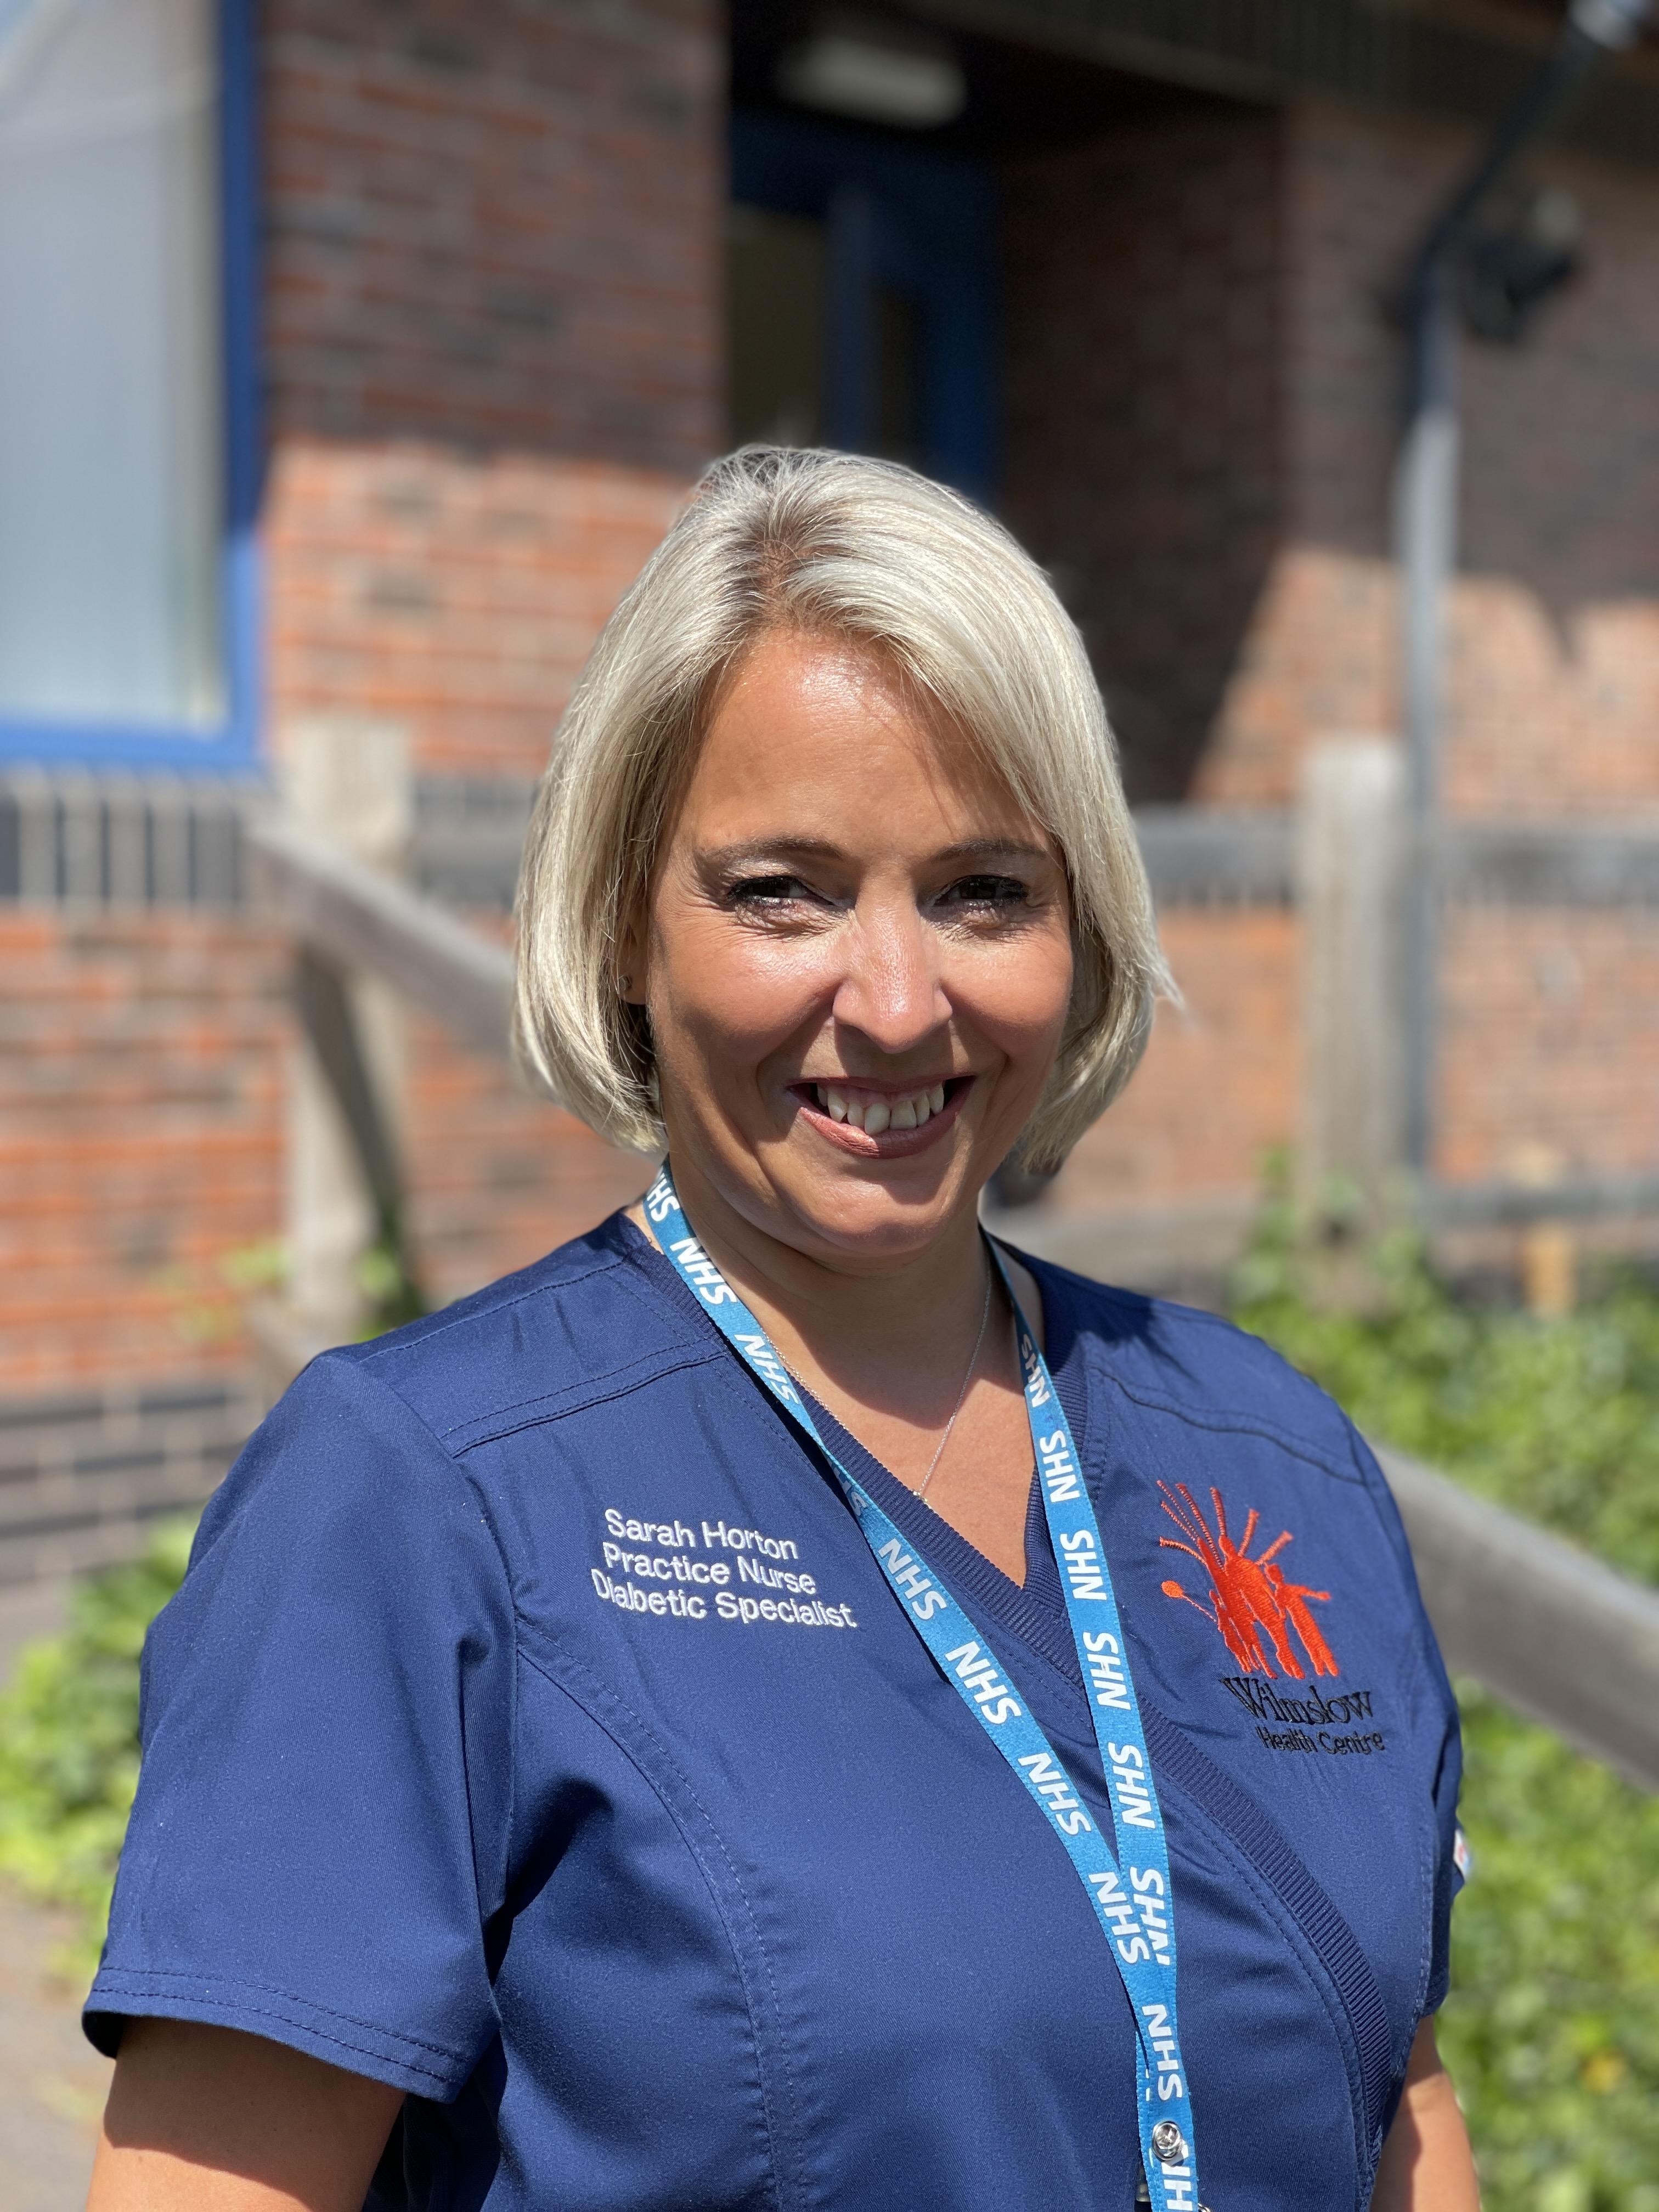 Sarah Horton Practice Nurse